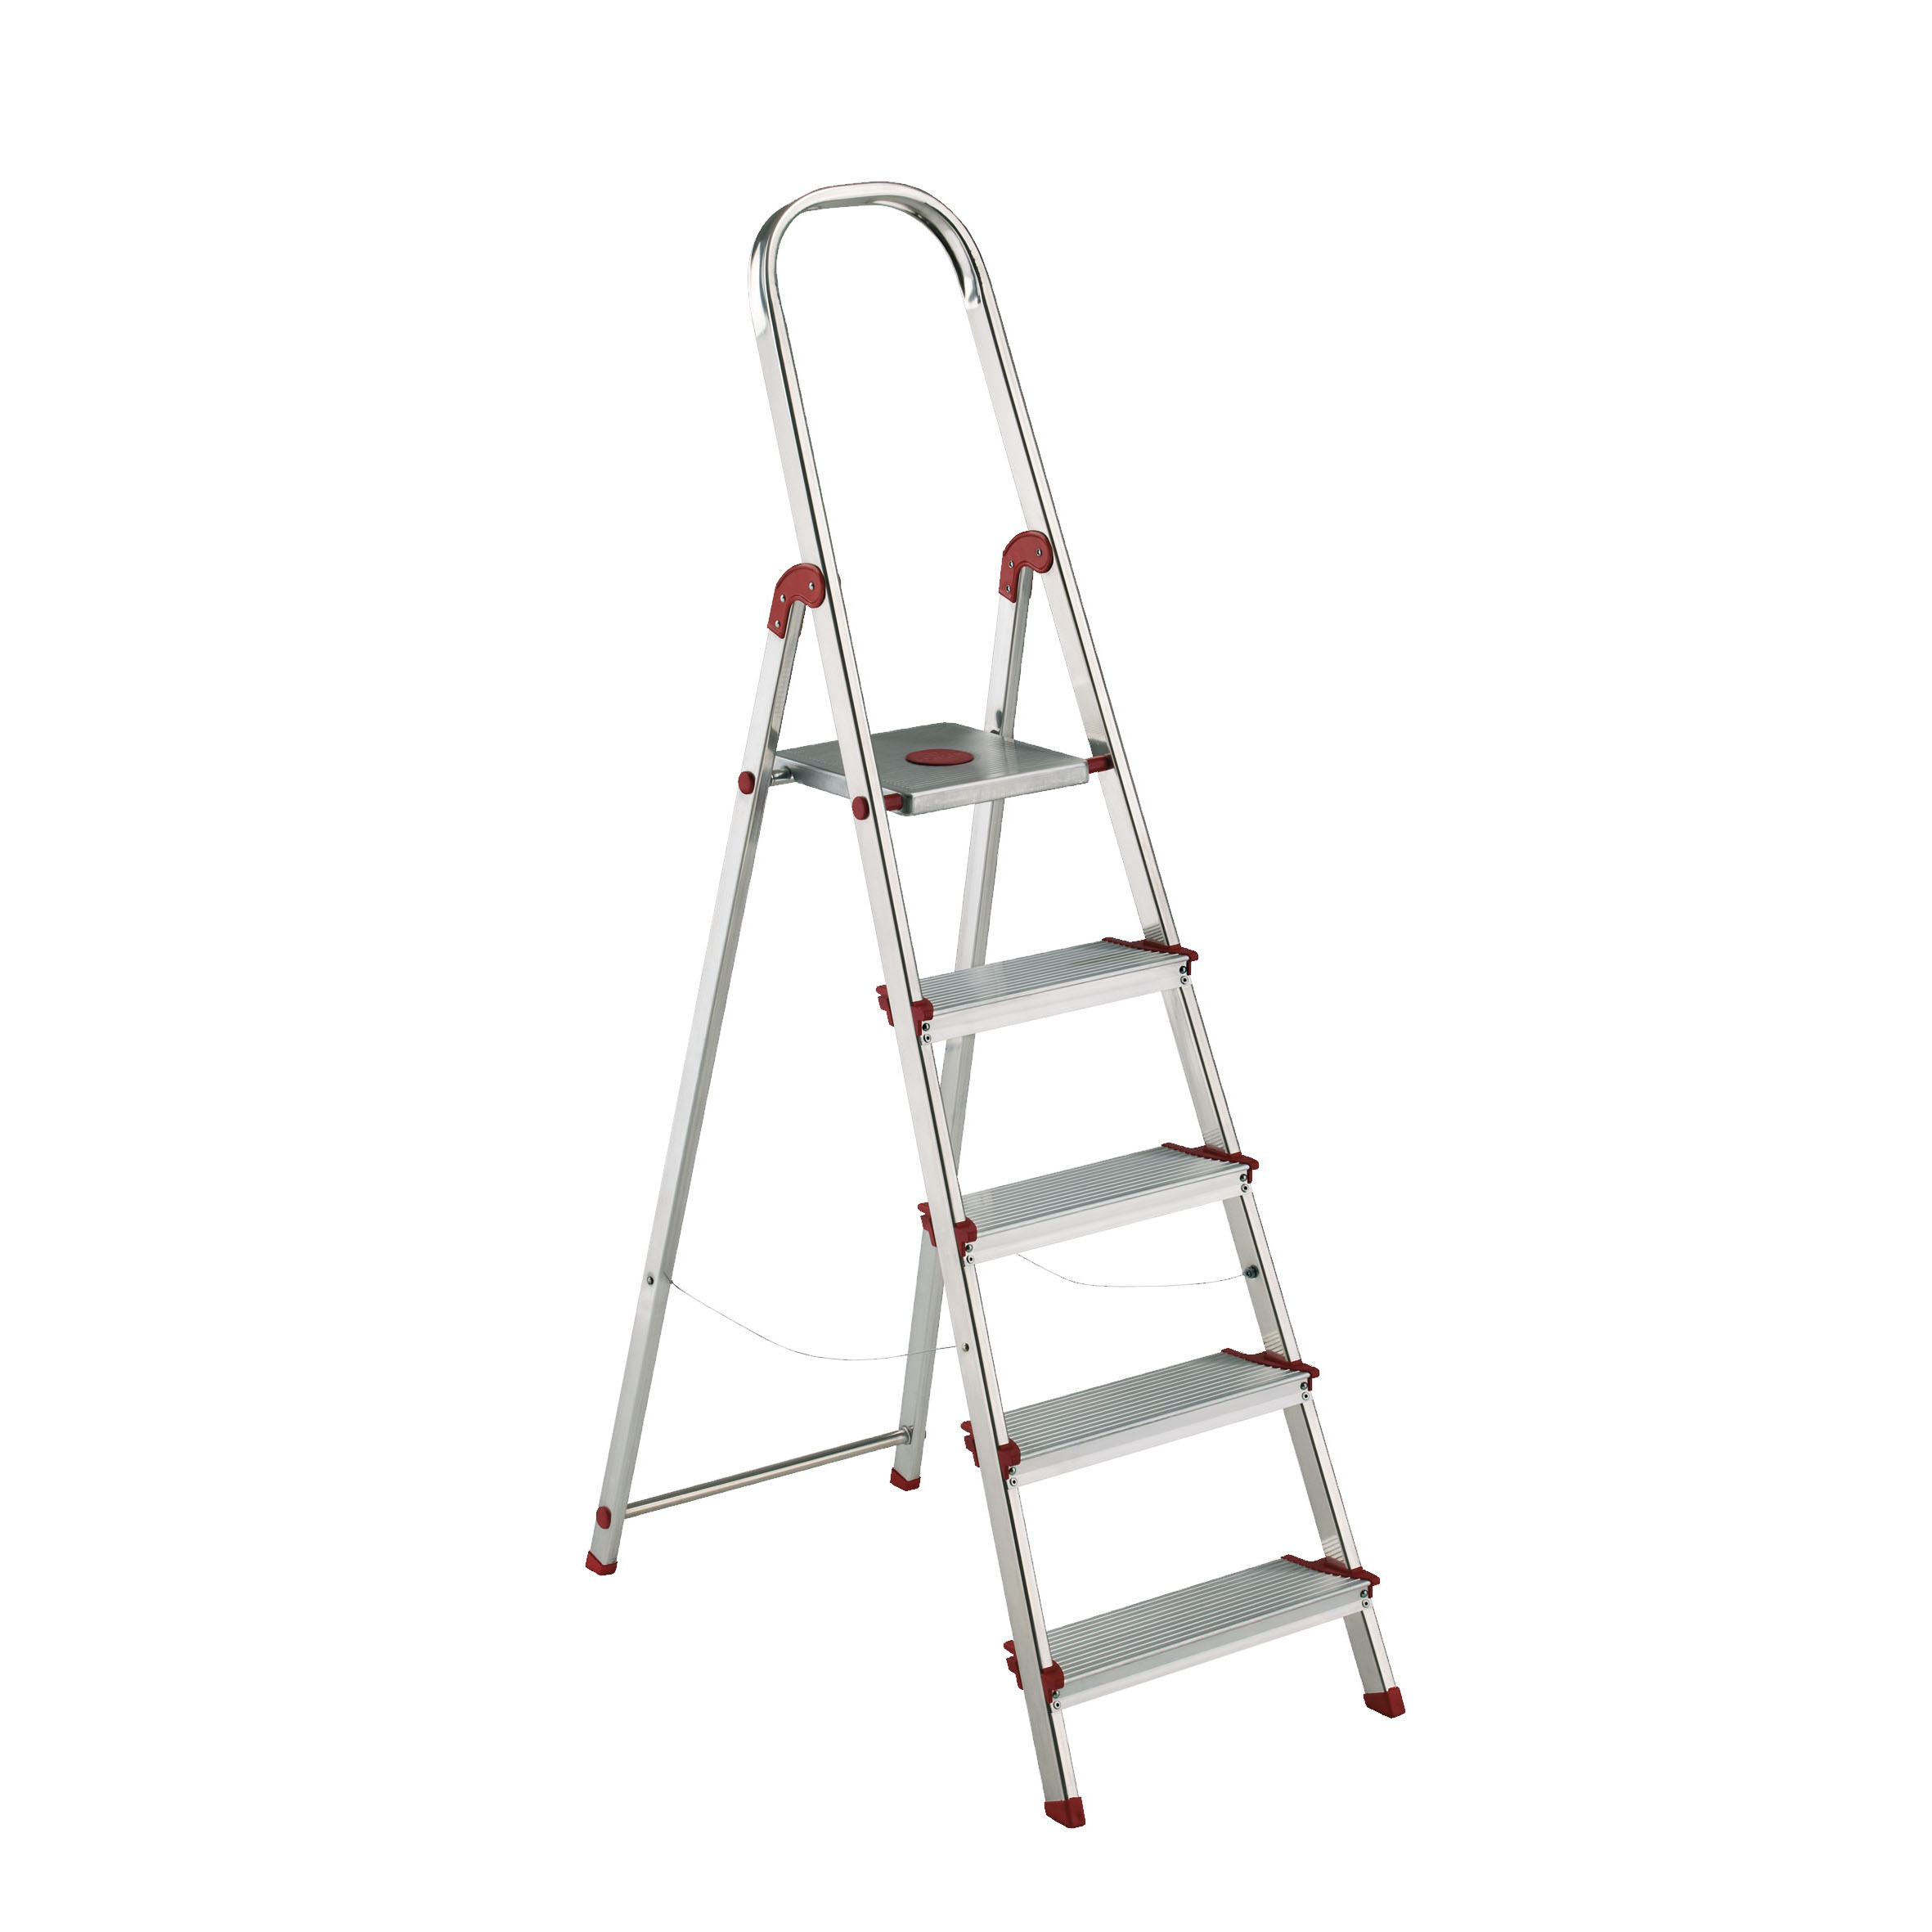 La escalera m s cool de rolser en eurobrico eurobrico for Eurobrico arco